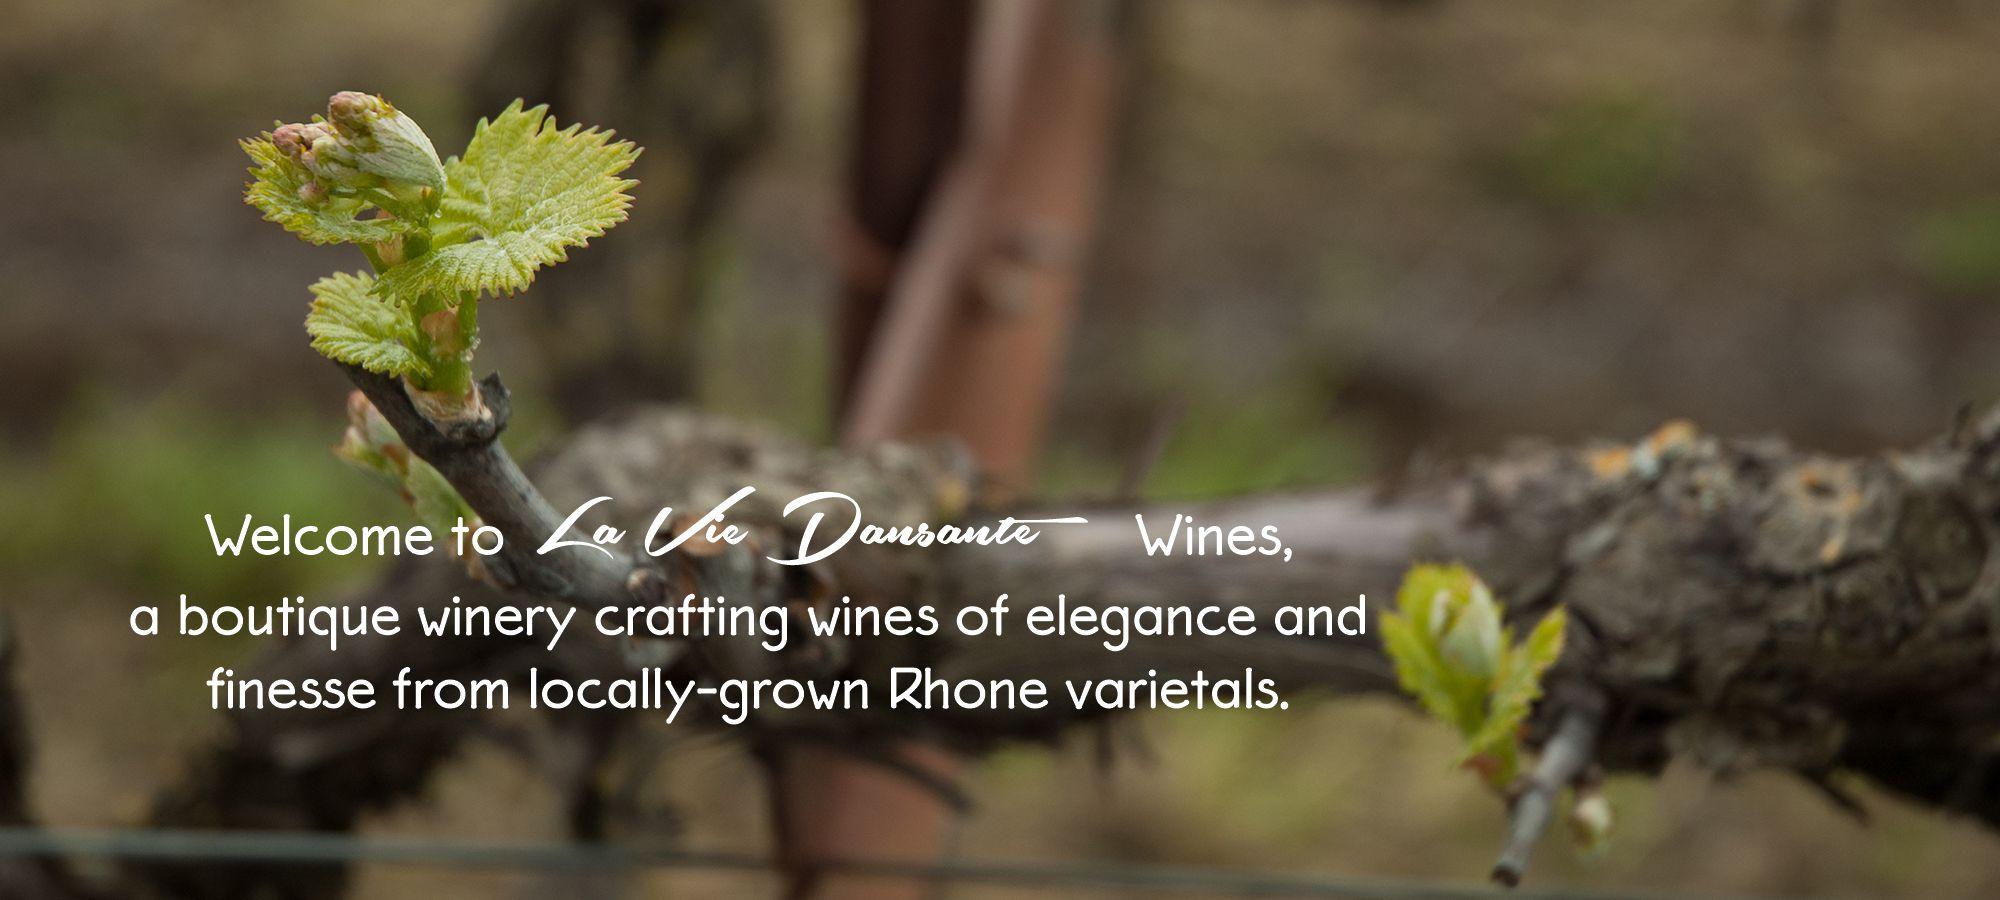 Welcome to La Vie Dansante Wines